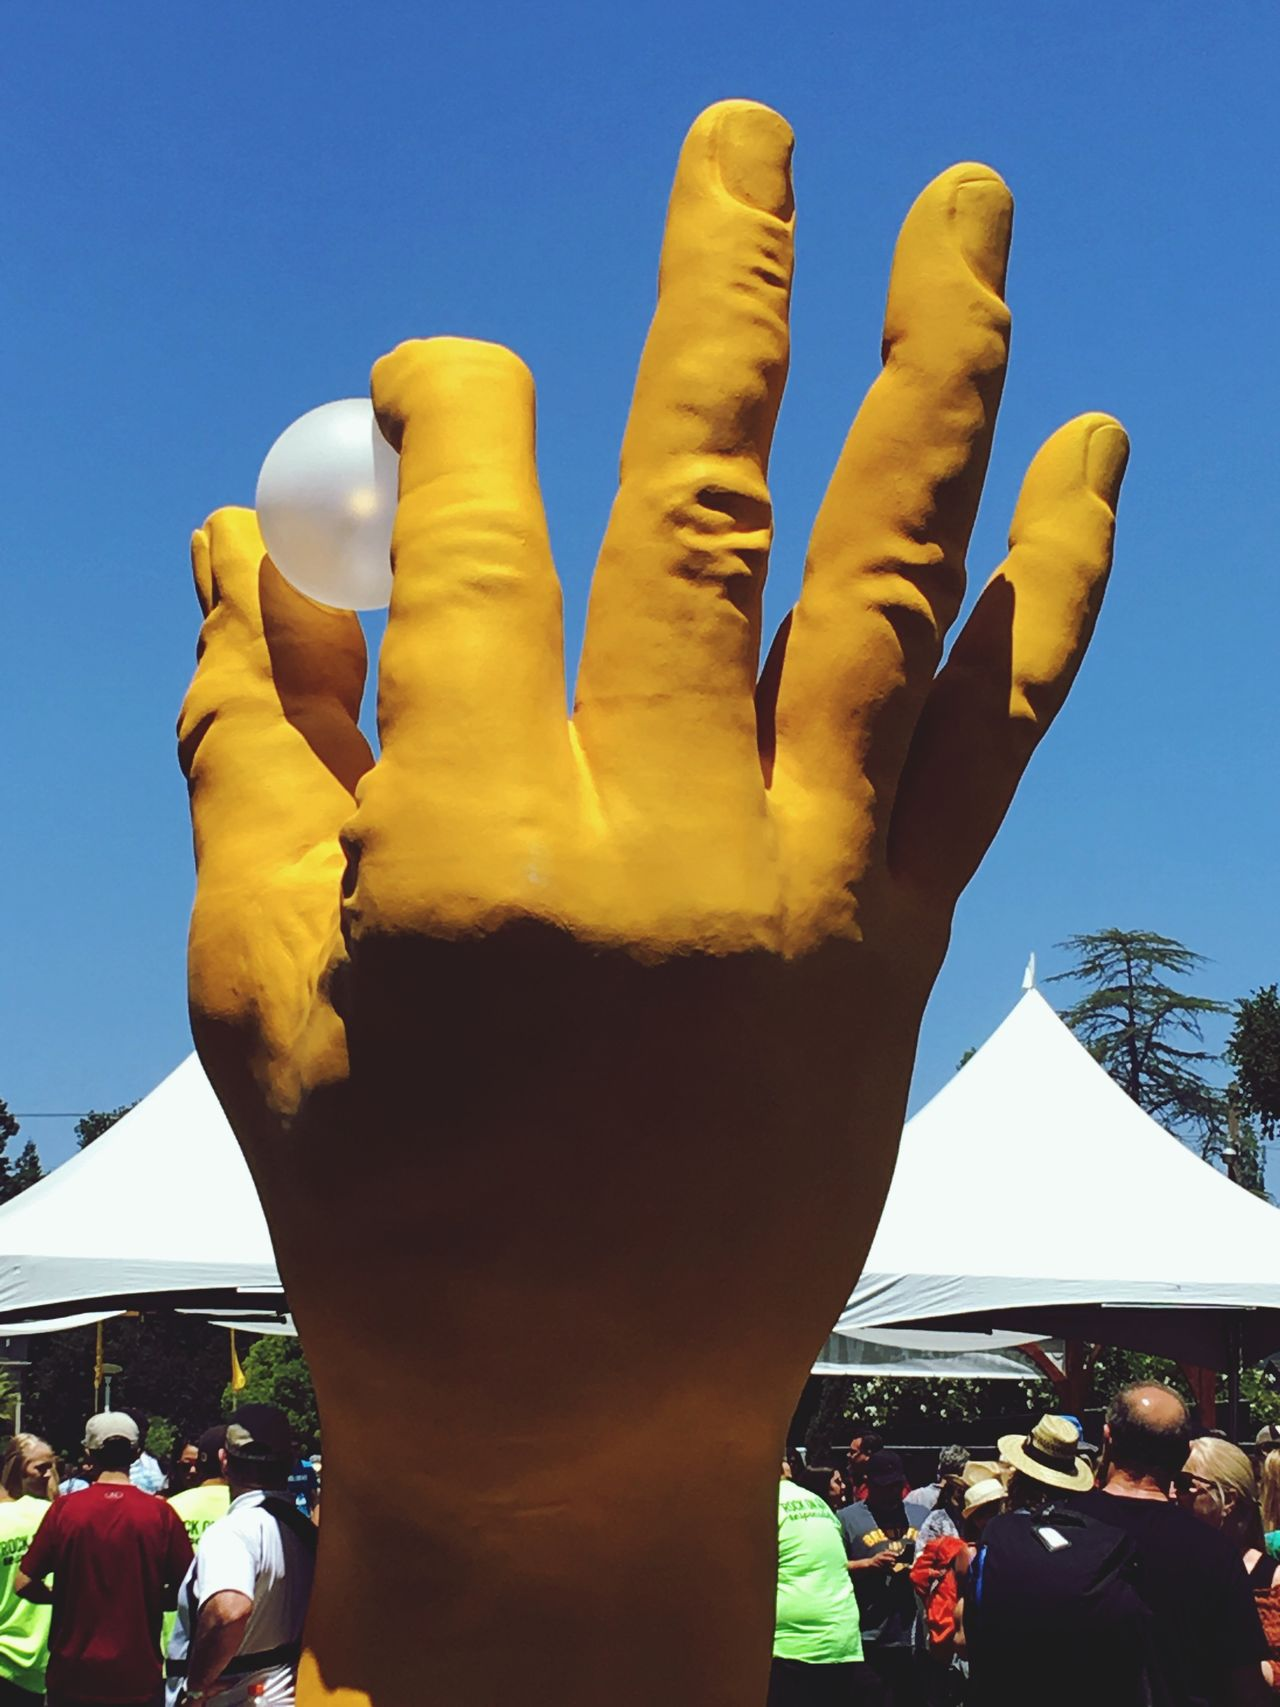 Human Body Part Human Hand Yellow Blue Sky Hand Fingers Hand Sign Hand Signals Hand Signal Hand Signs Sculpture Hand Model Hand Modeling Ping Pong Ping Pong Ball